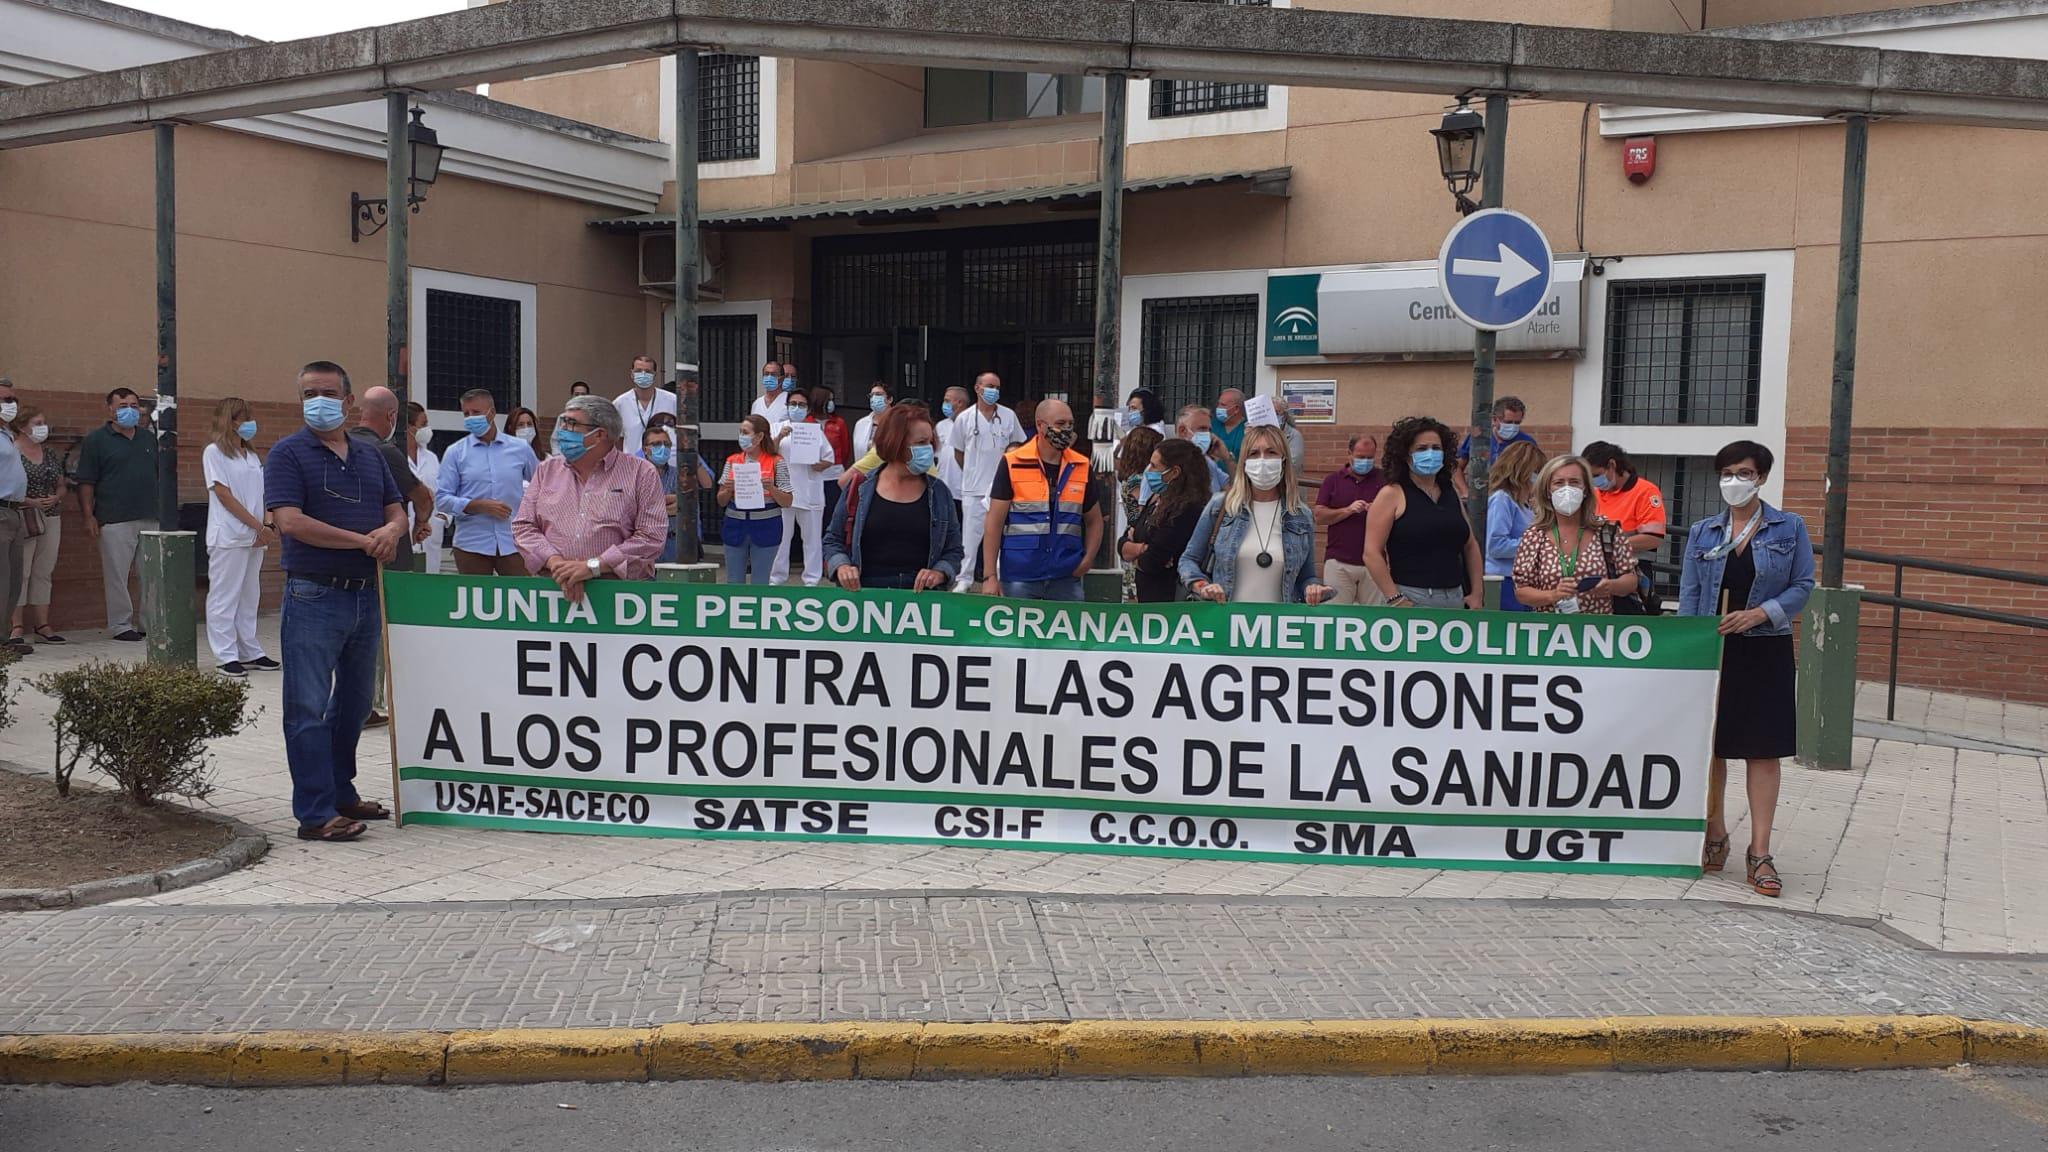 Condenan la agresión a un profesional sanitario en Atarfe